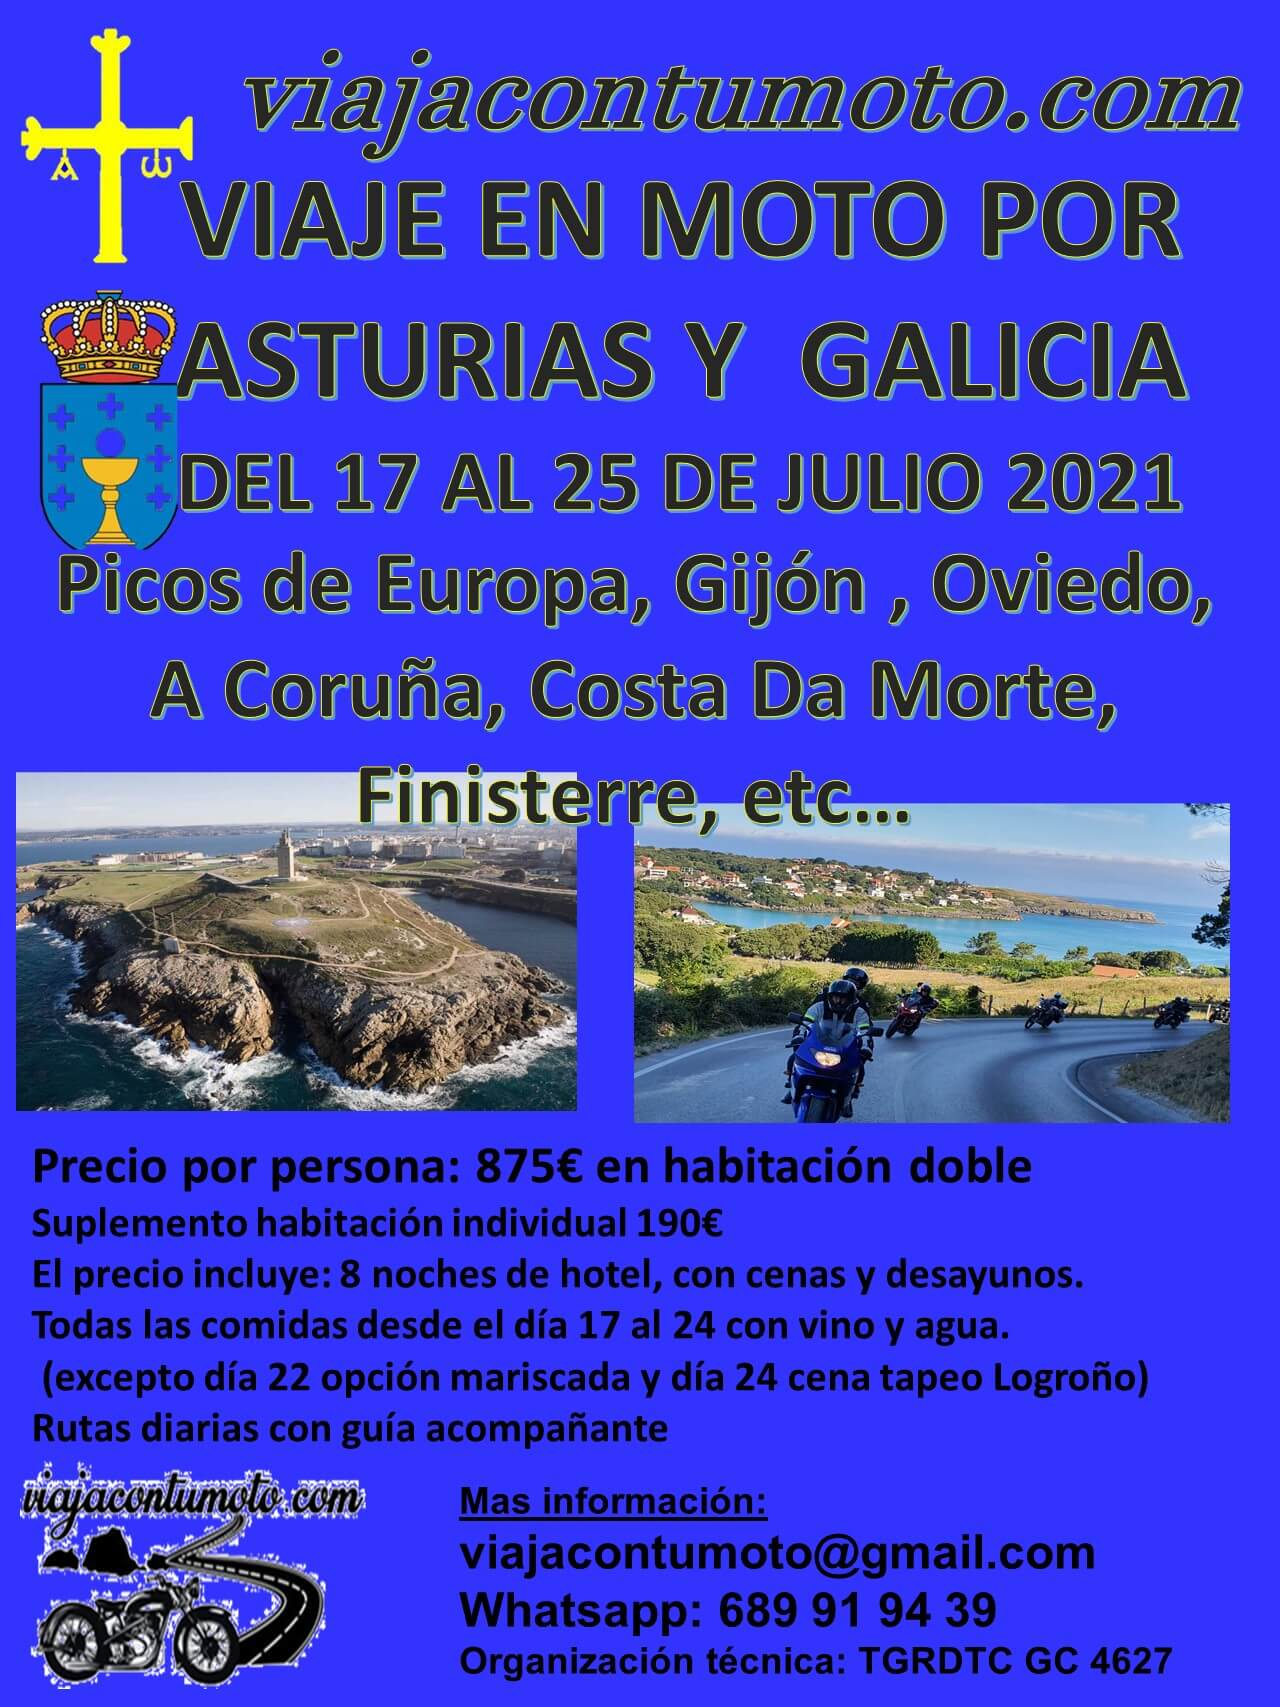 Viaje Motero por Asturias y Galicia, organizado por Viaja con tu Moto.